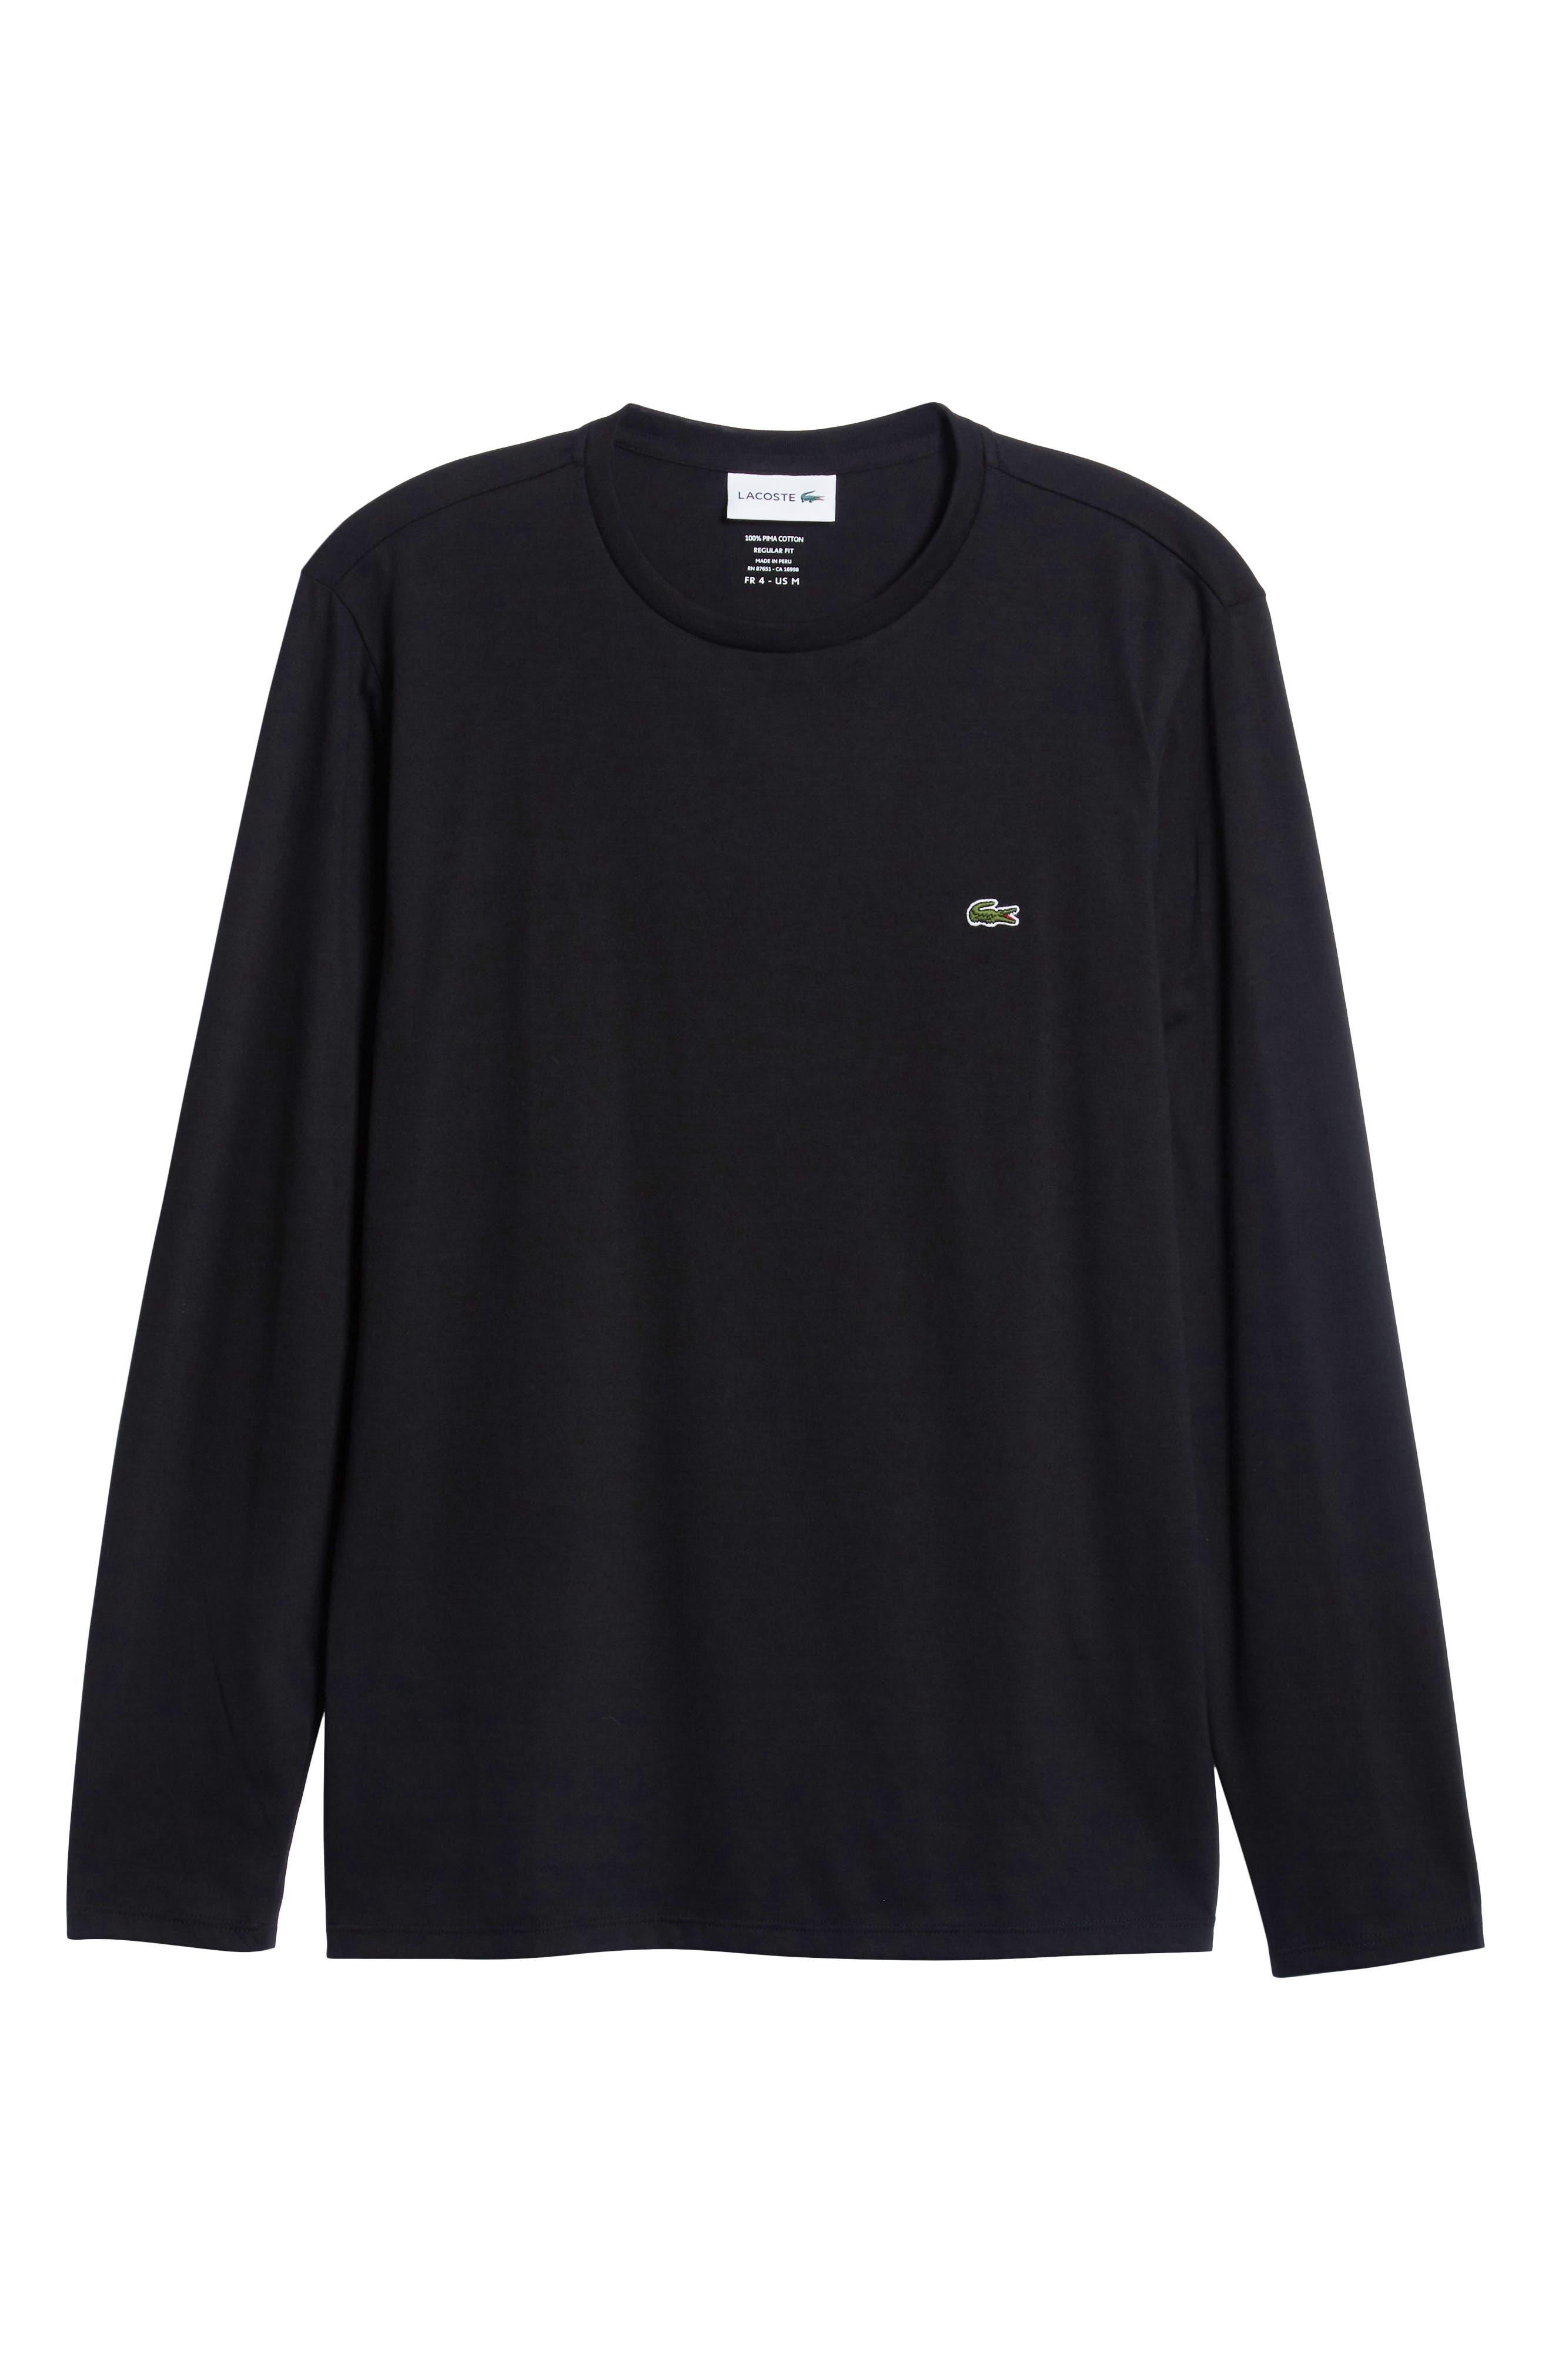 LACOSTE, Long Sleeve Pima Cotton T-Shirt, Alternate thumbnail 6, color, BLACK